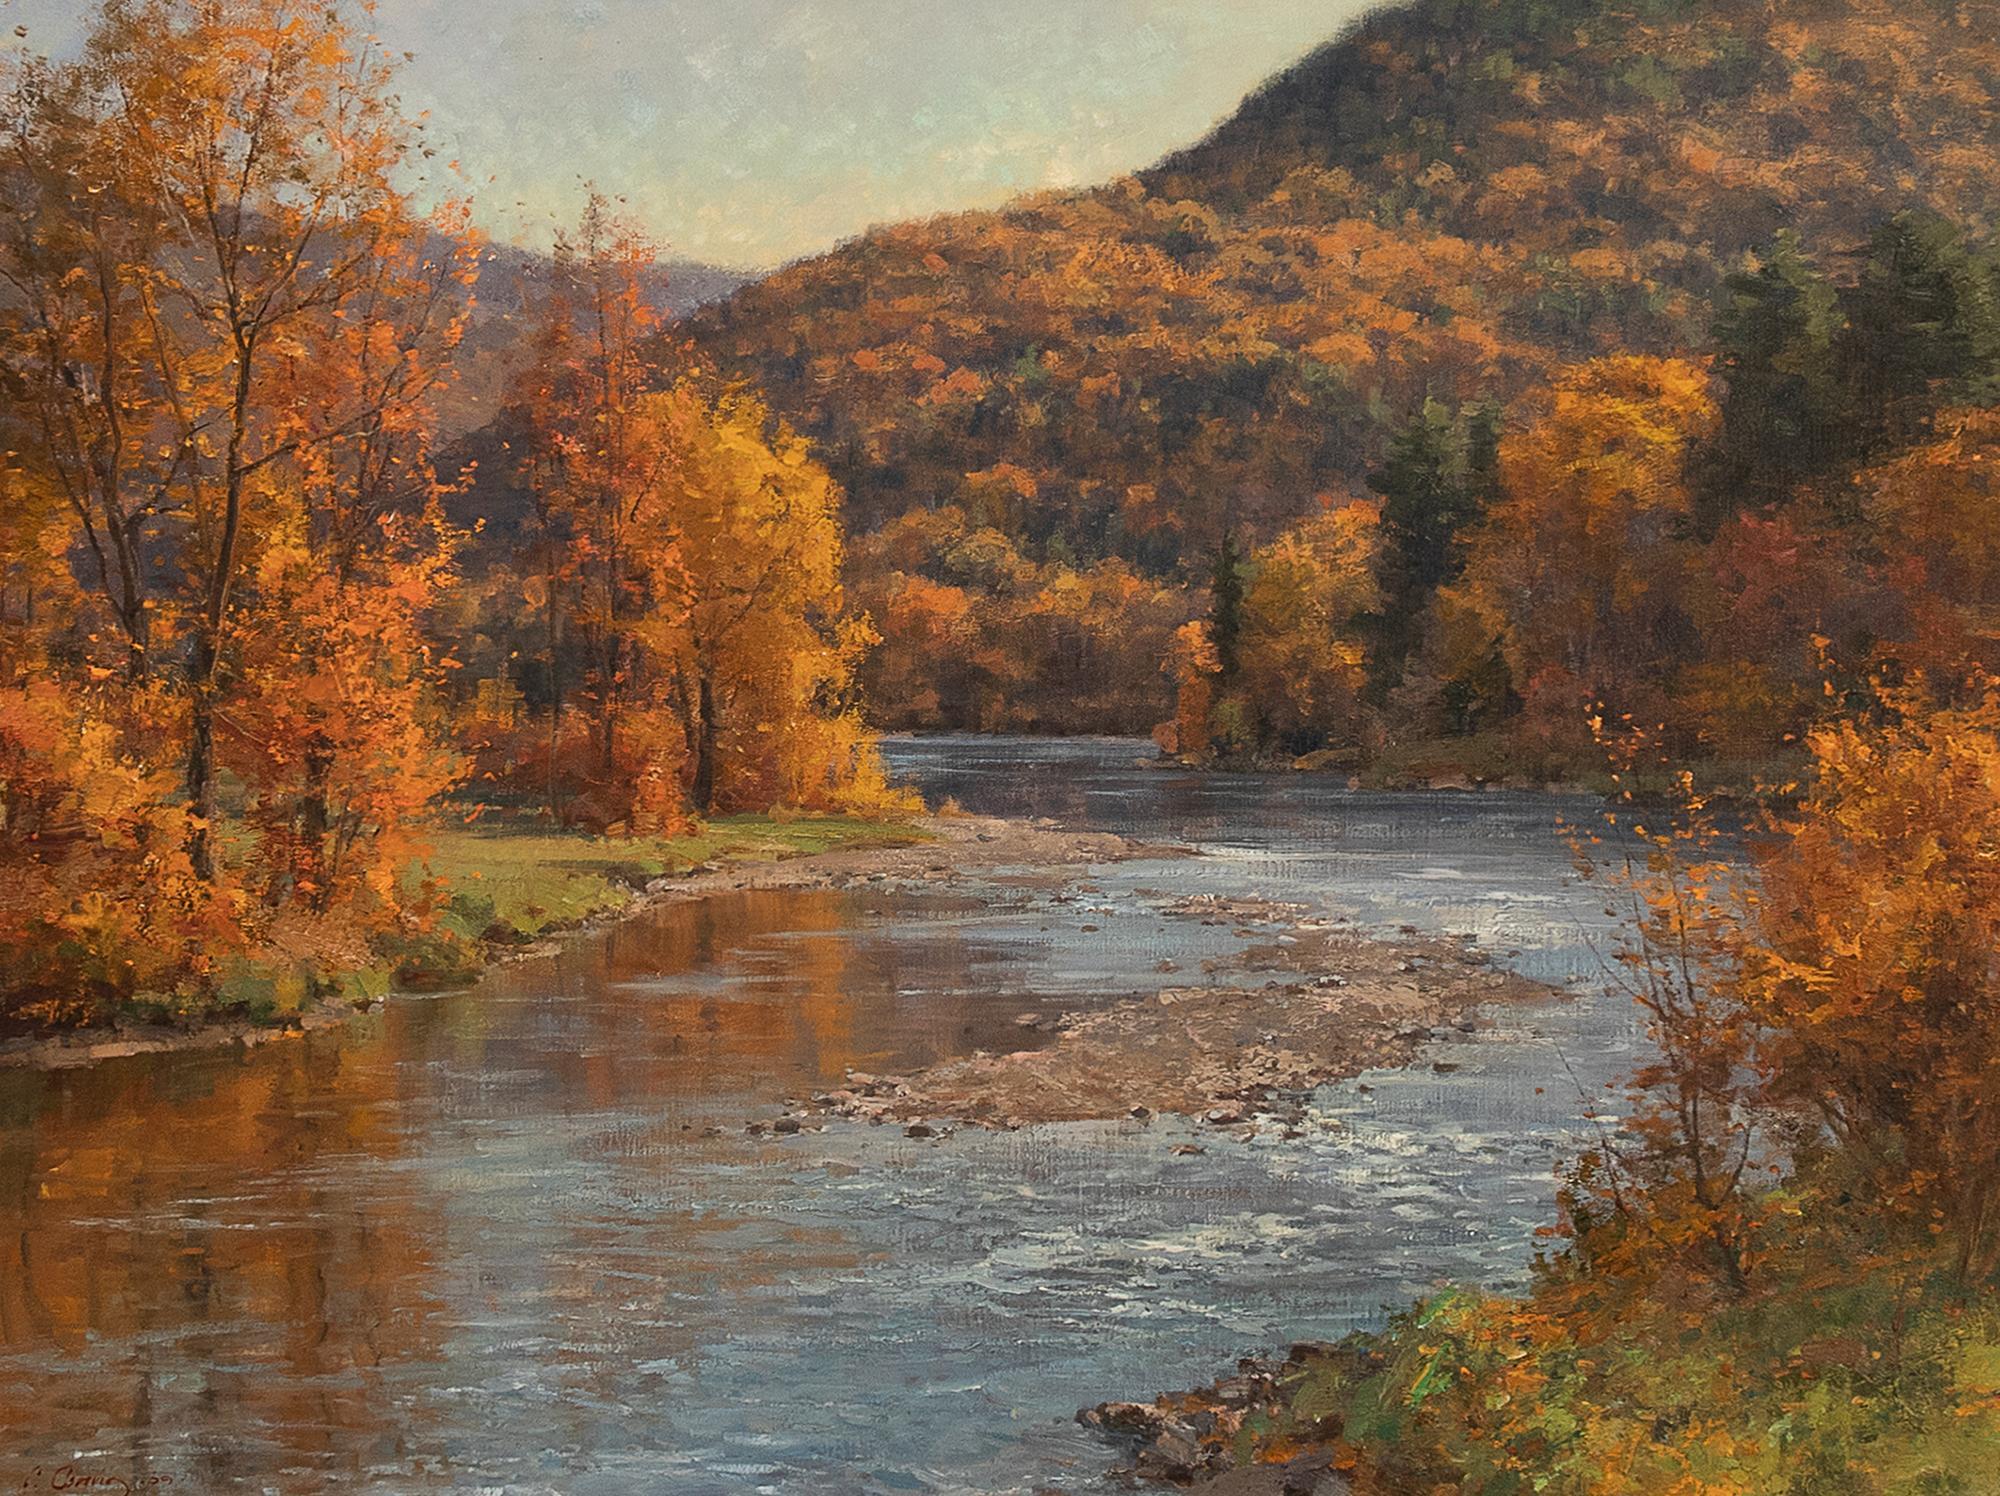 The Deerfield River